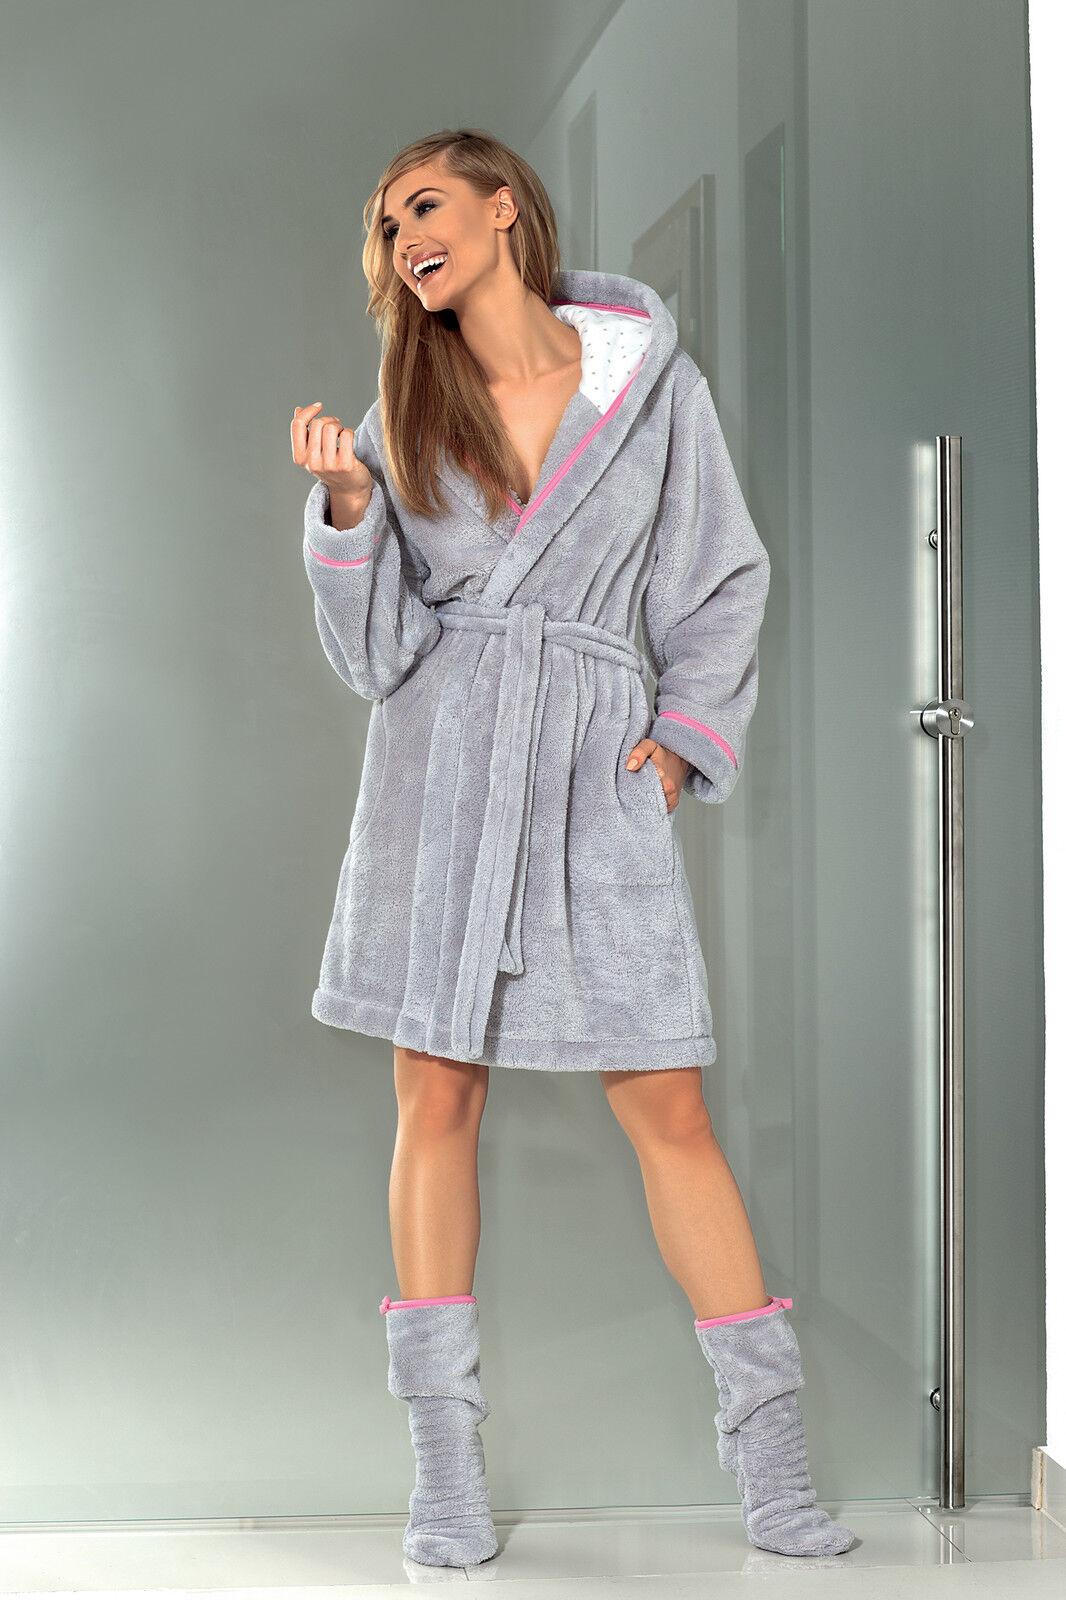 Womens Luxury Soft Bath Robe Housecoat Dressing Gown Bathrobe With Belt And Hood